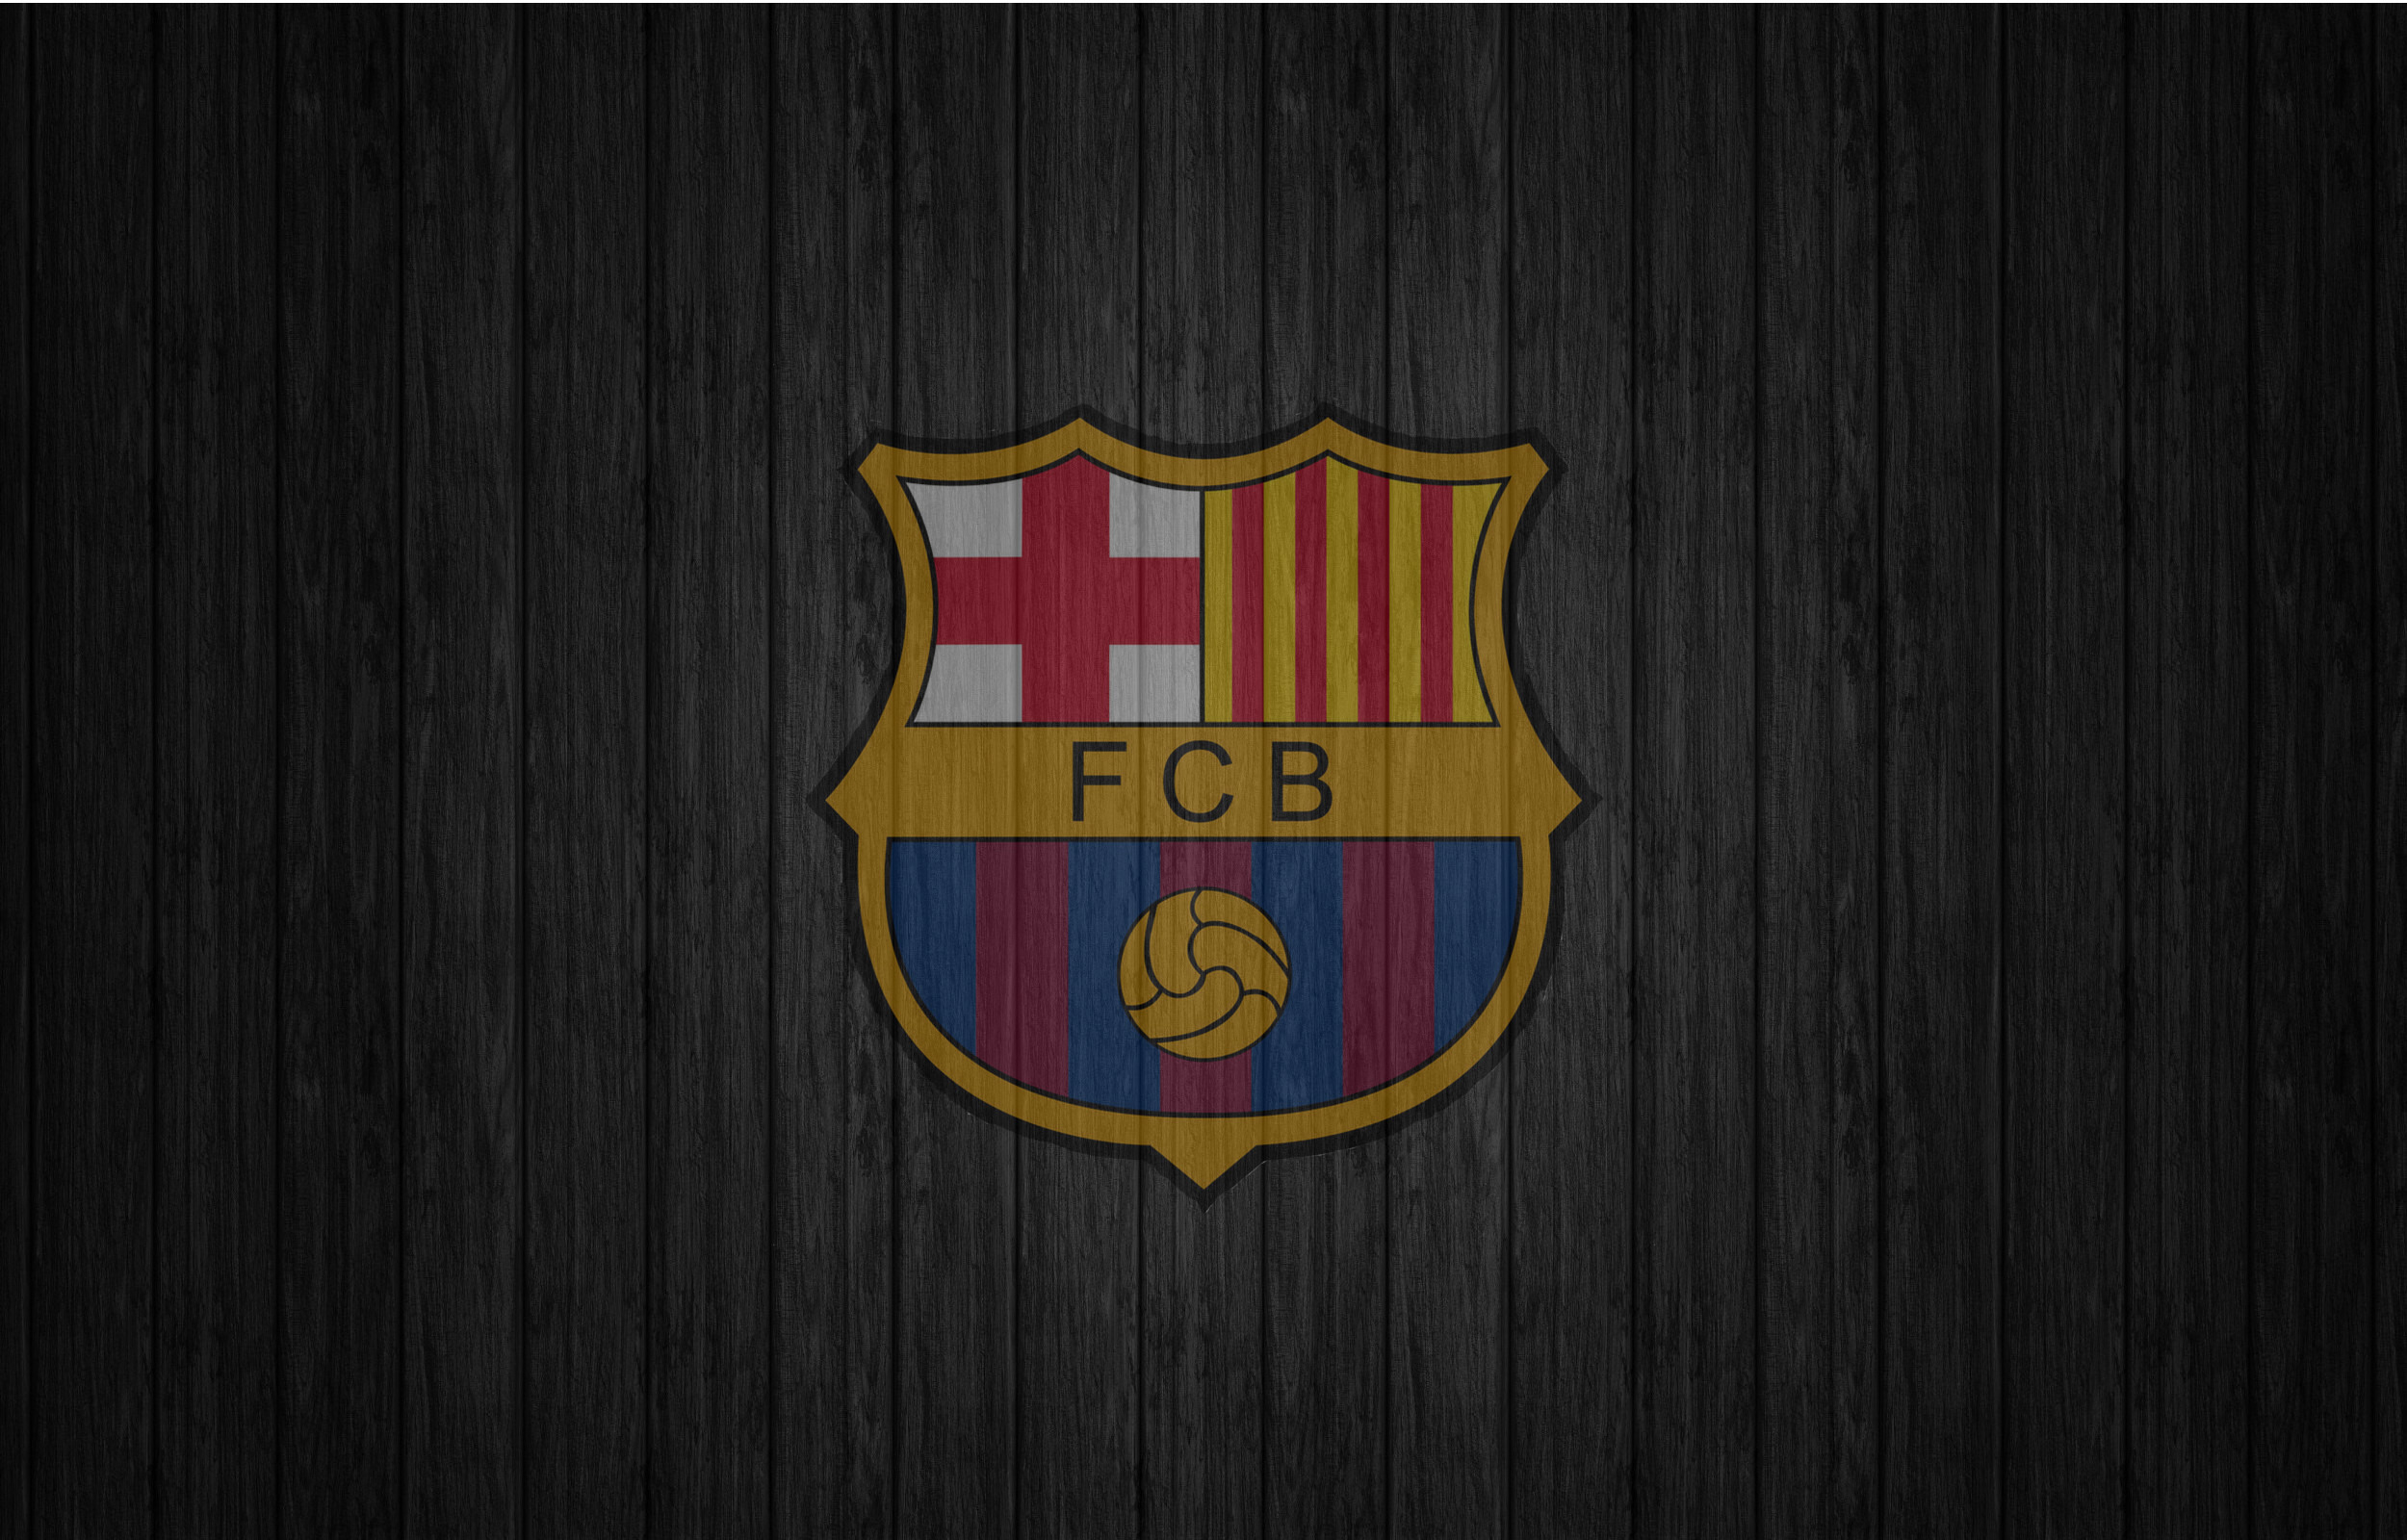 FC Barcelona Wallpaper 112 Dark Wood Logo Backgrounds